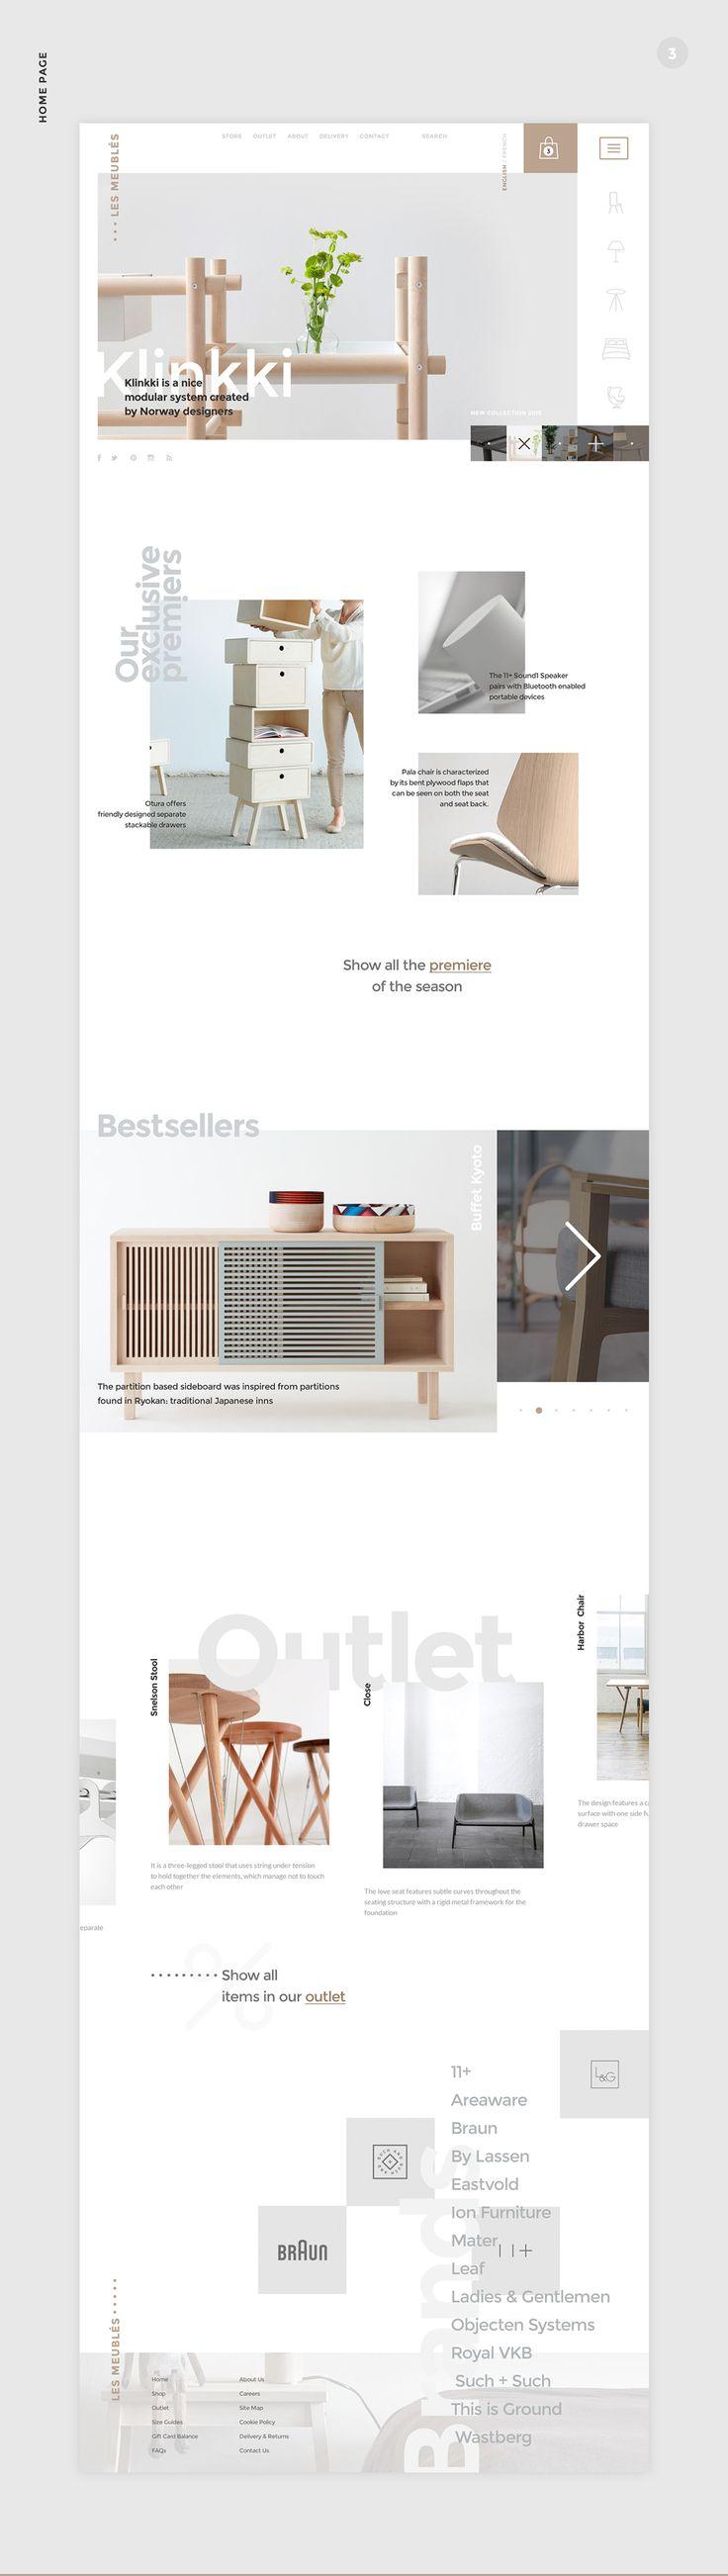 Les Meublés | Free PSD on Web Design Served